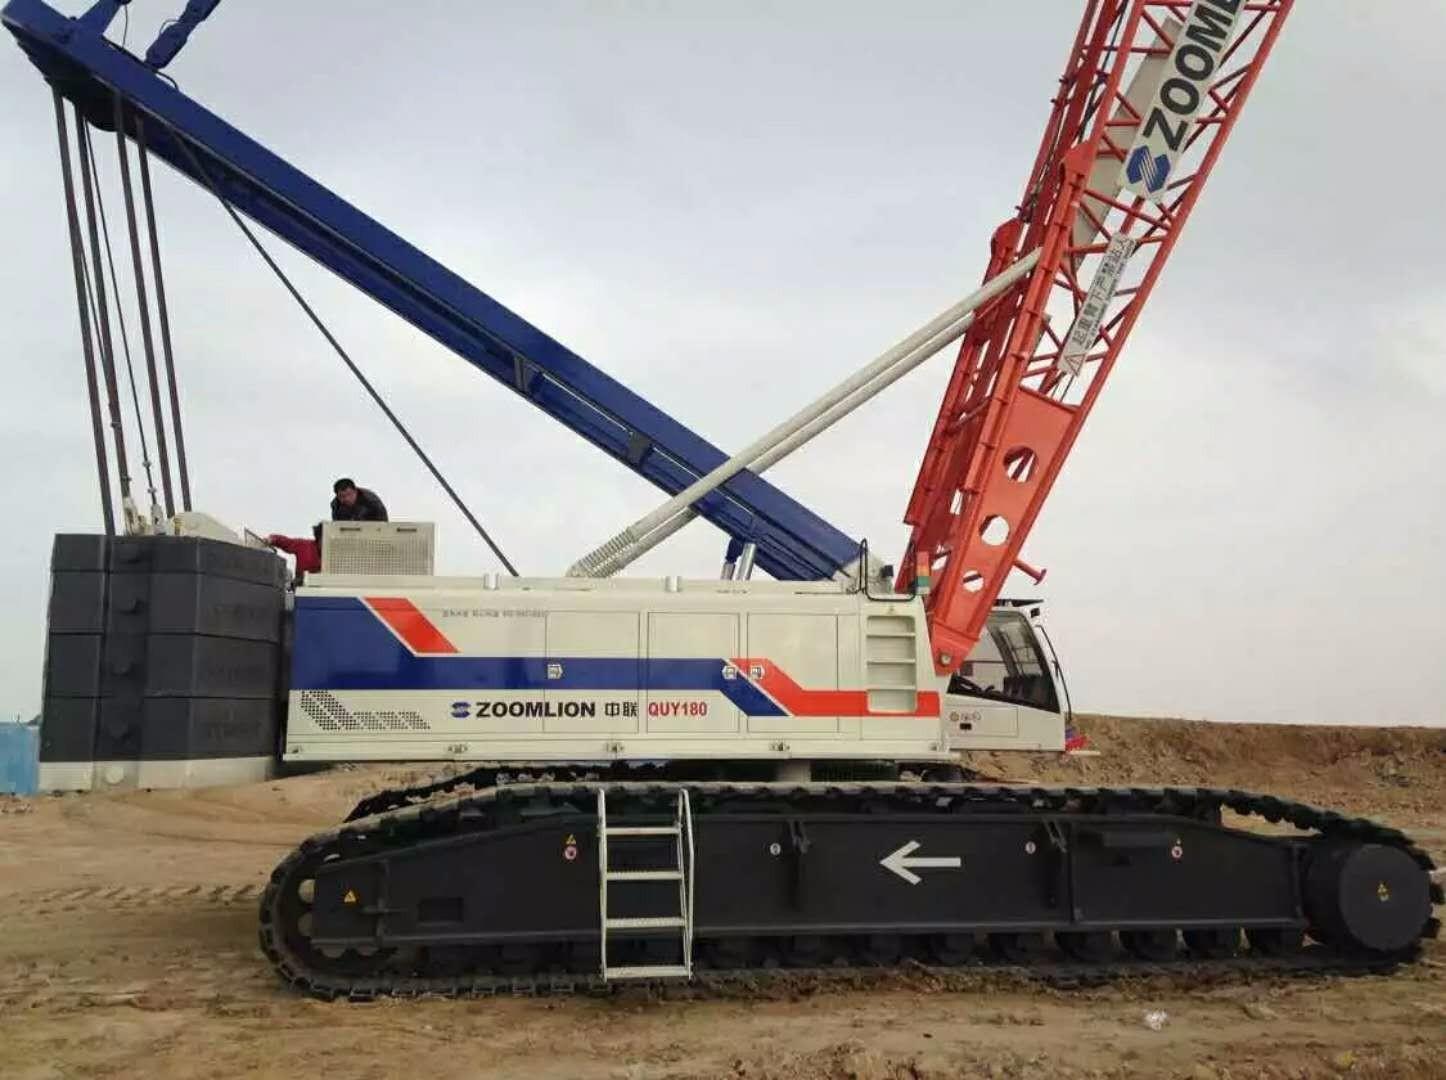 [出租]中联重科-QUY180-180吨